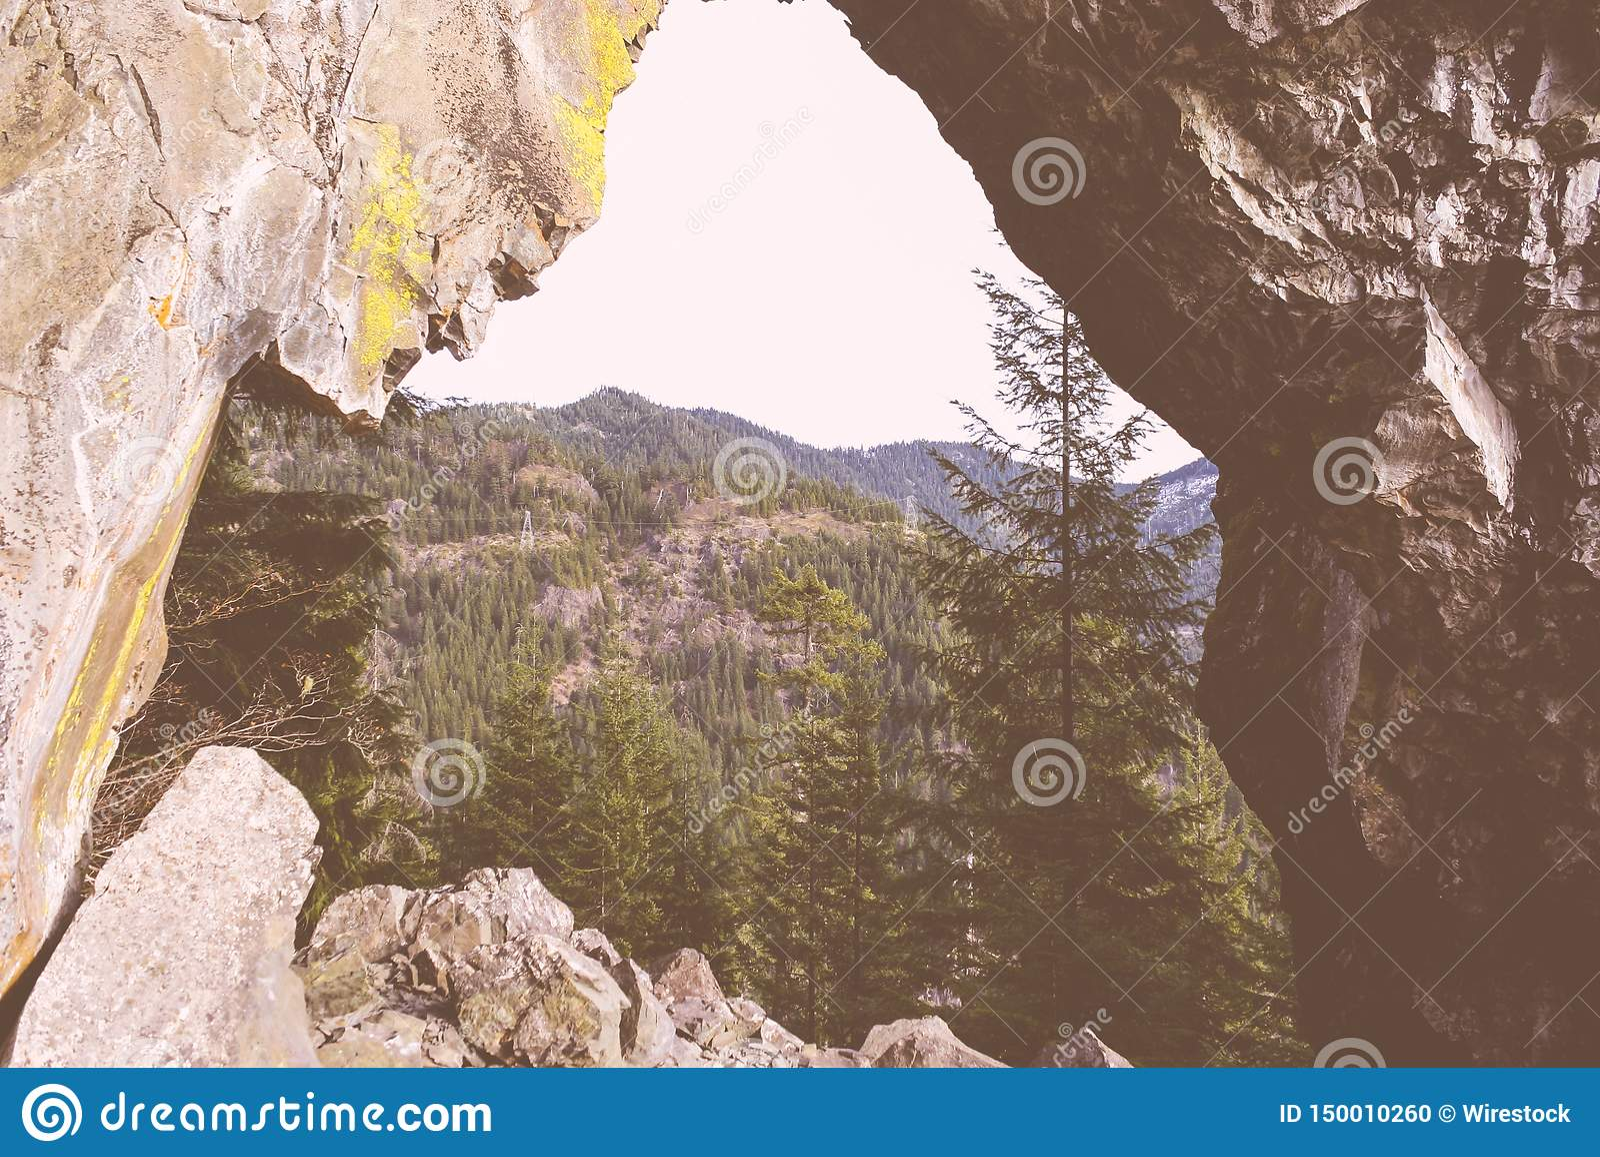 Piękny strzał wysokie skaliste góry i las